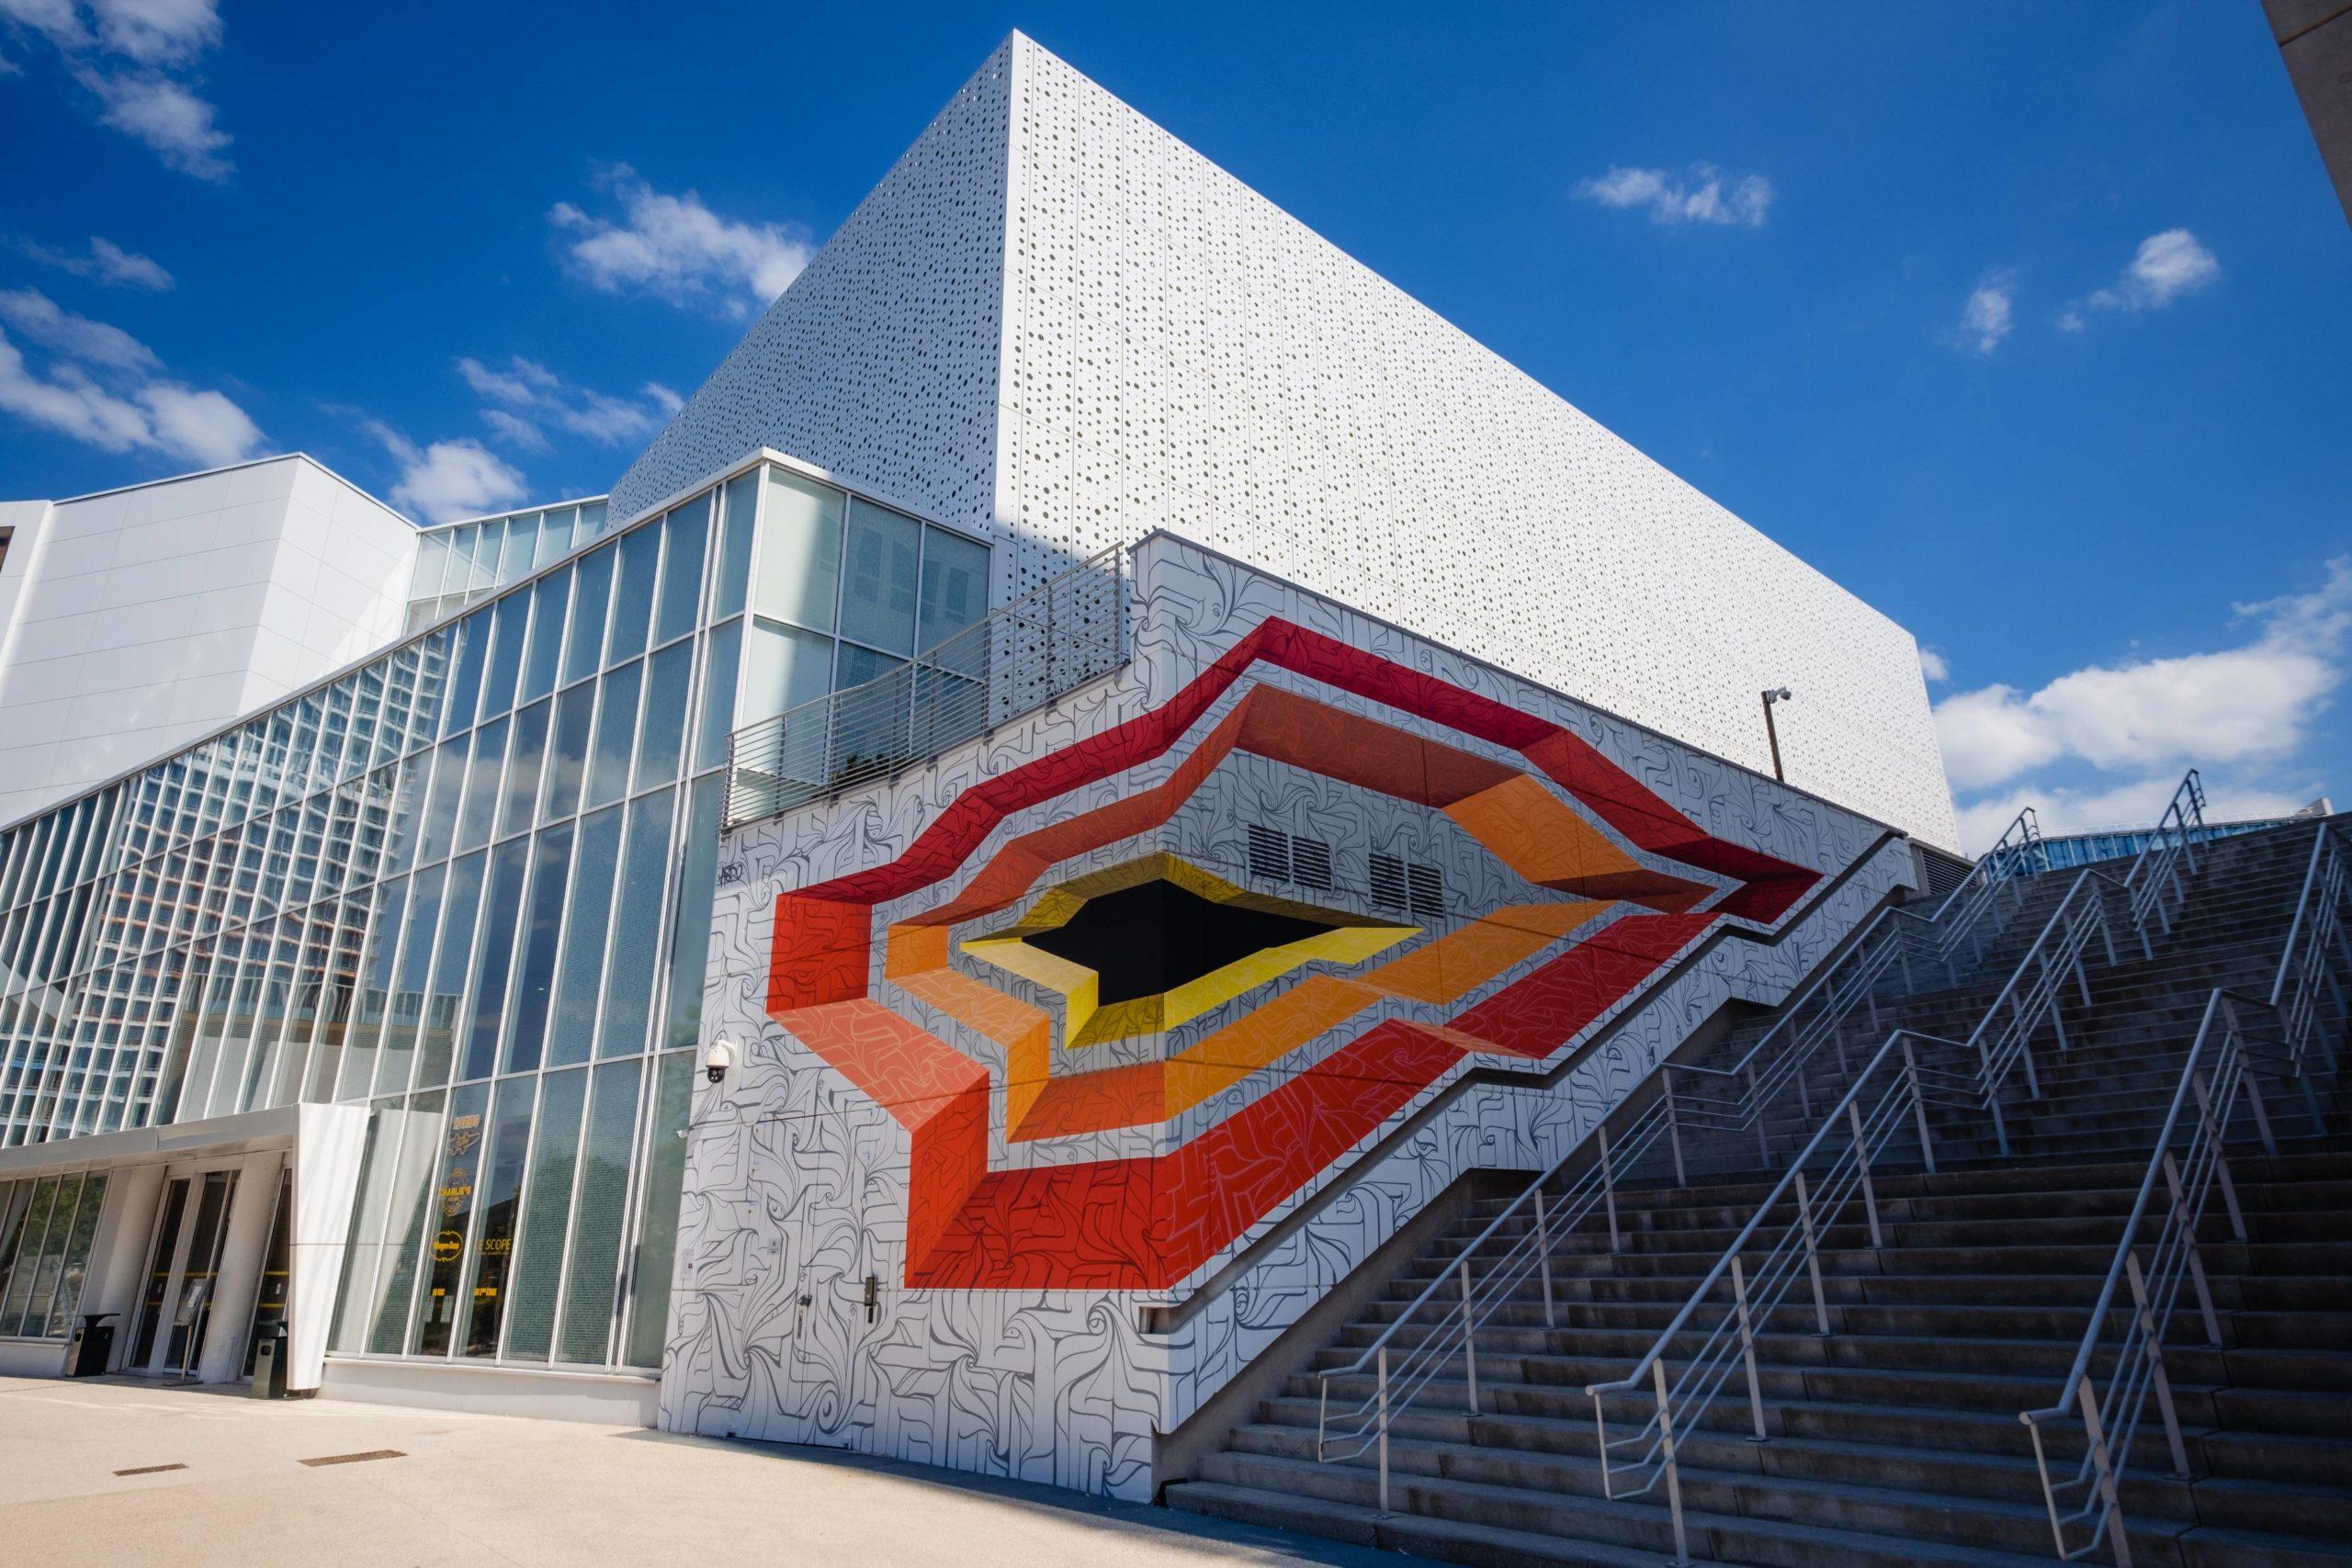 Astro, Architectural Evasion 1 & 2, 2020 (Euromed Center, Marseille, Covivio, Massimiliano Fuksas) © Gilles Perbal 1